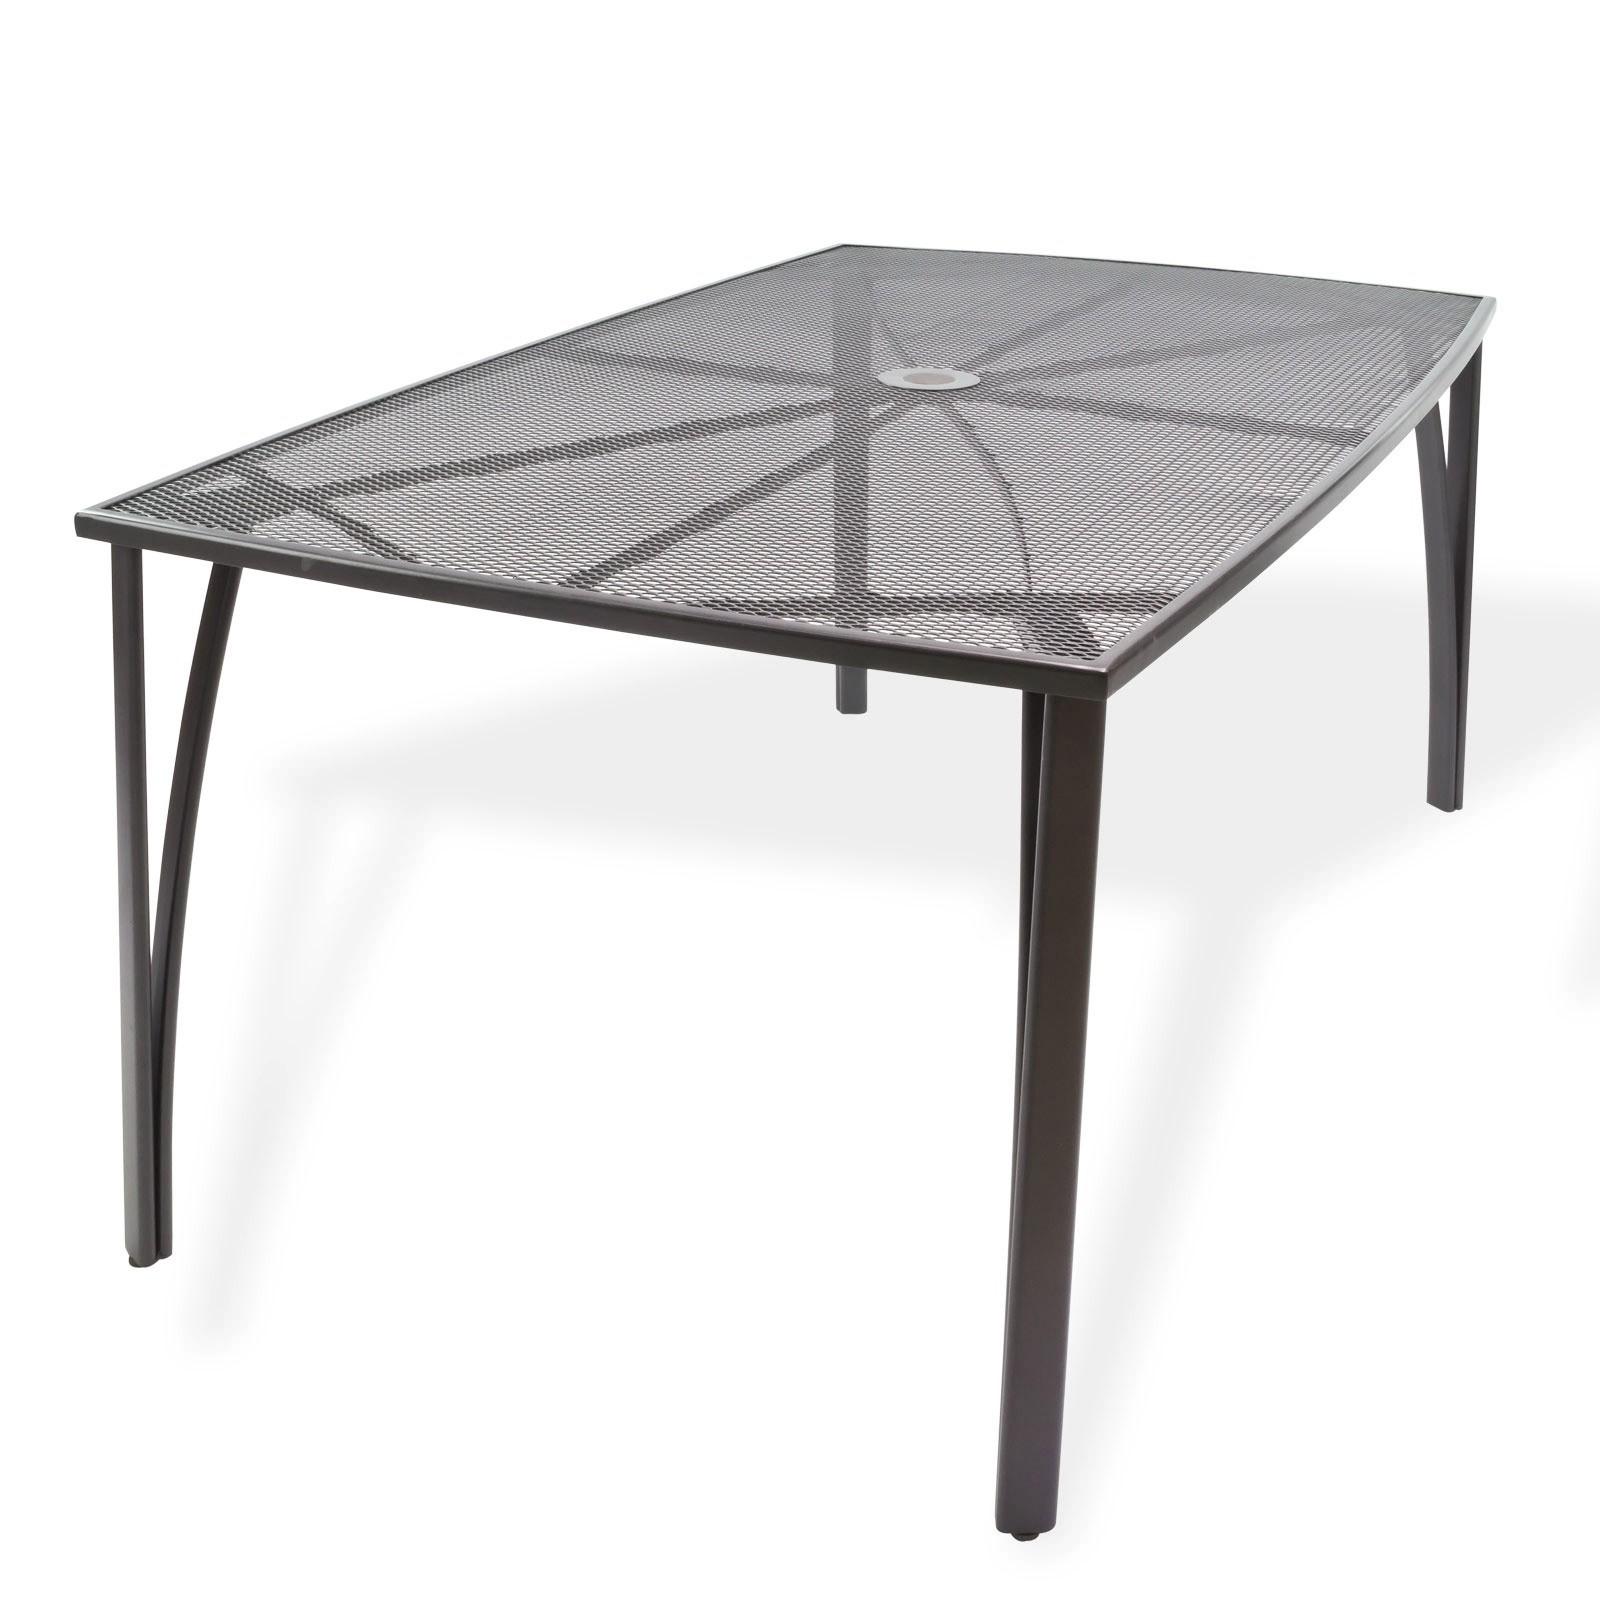 Gartenmobel Aus Streckmetall Set 1 X Tisch 4 X Stuhl